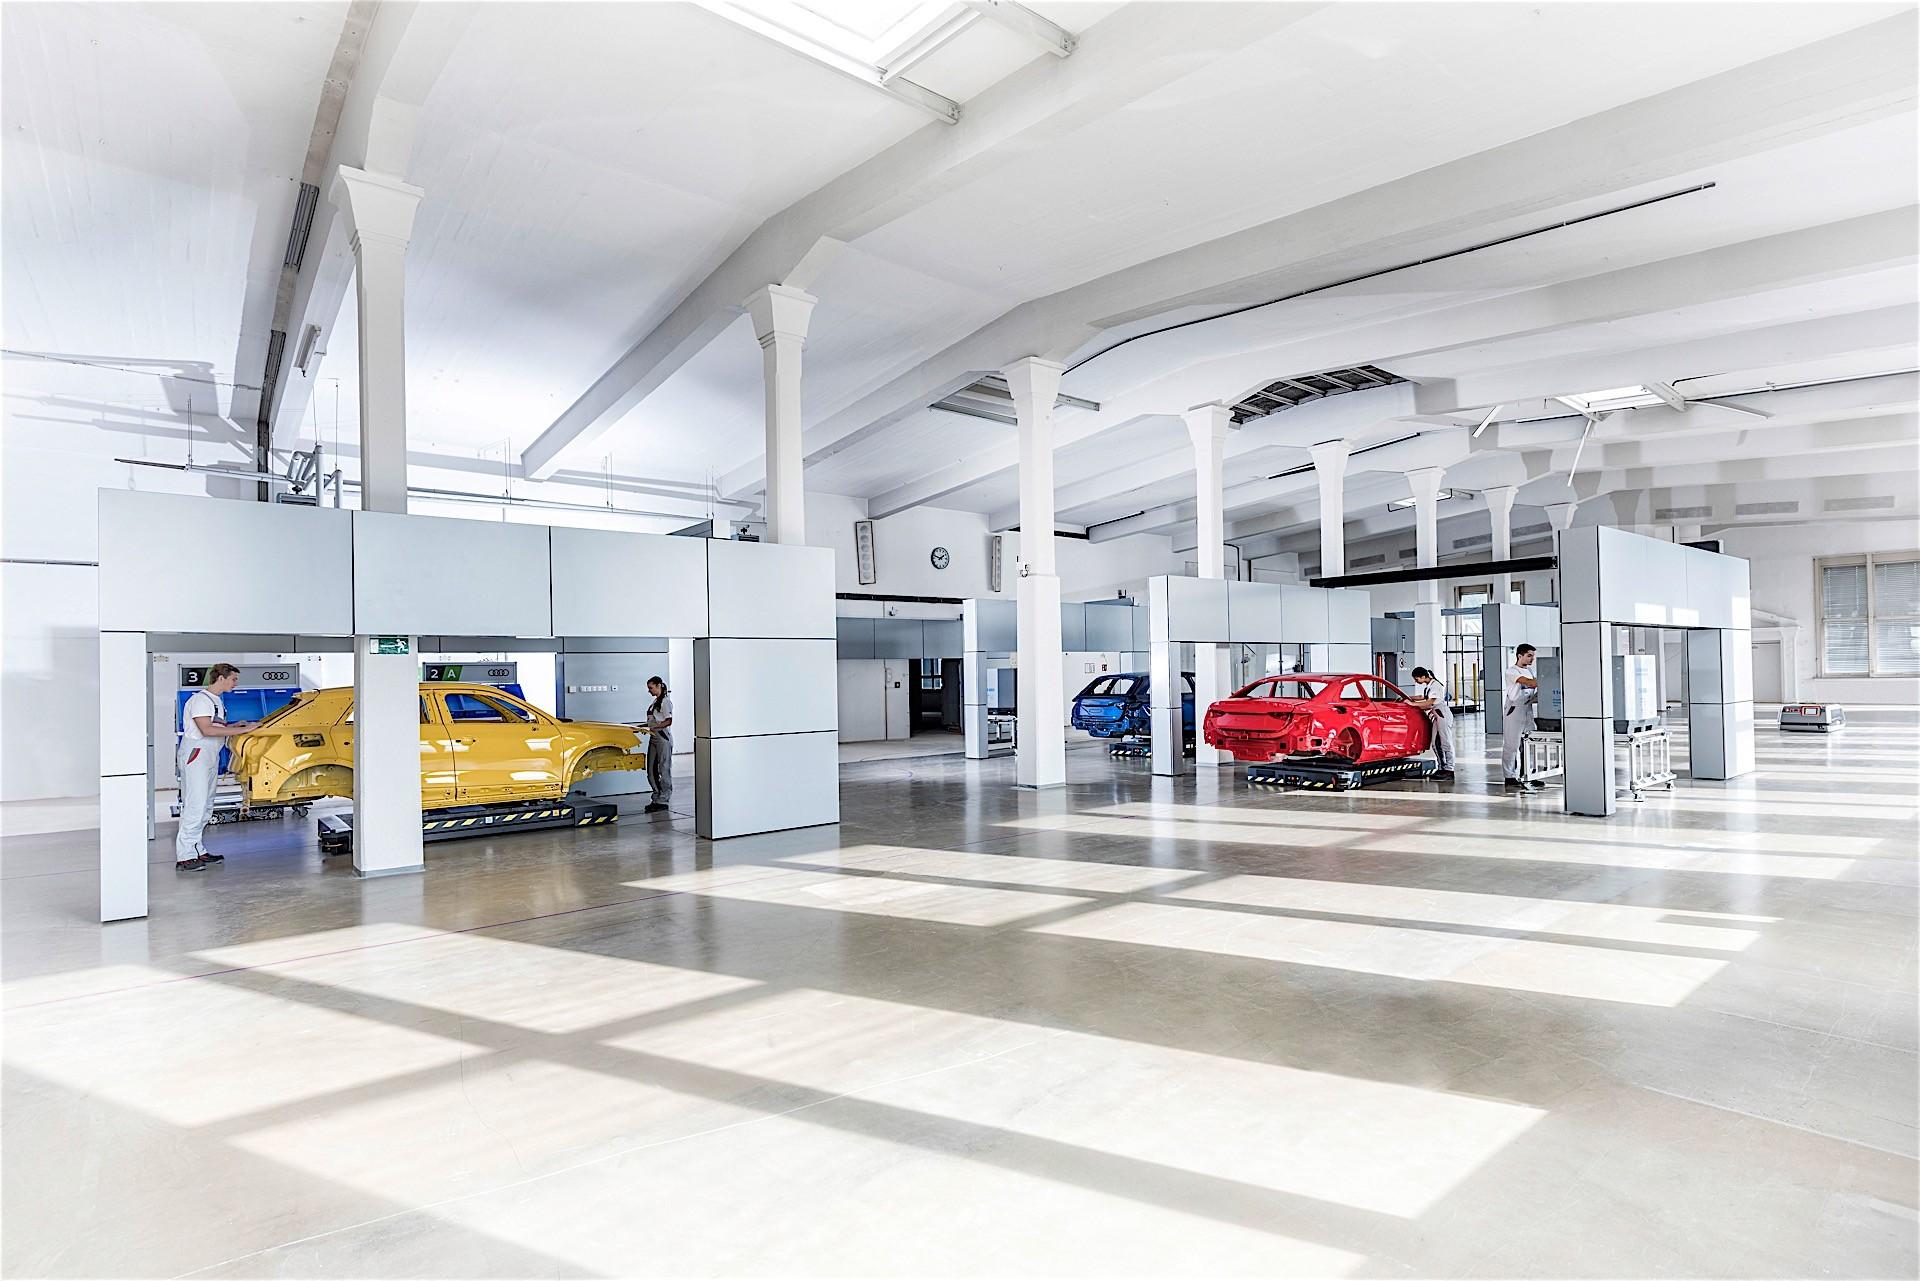 Audi Hires Senior Volvo Executive For Technical Development - autoevolution